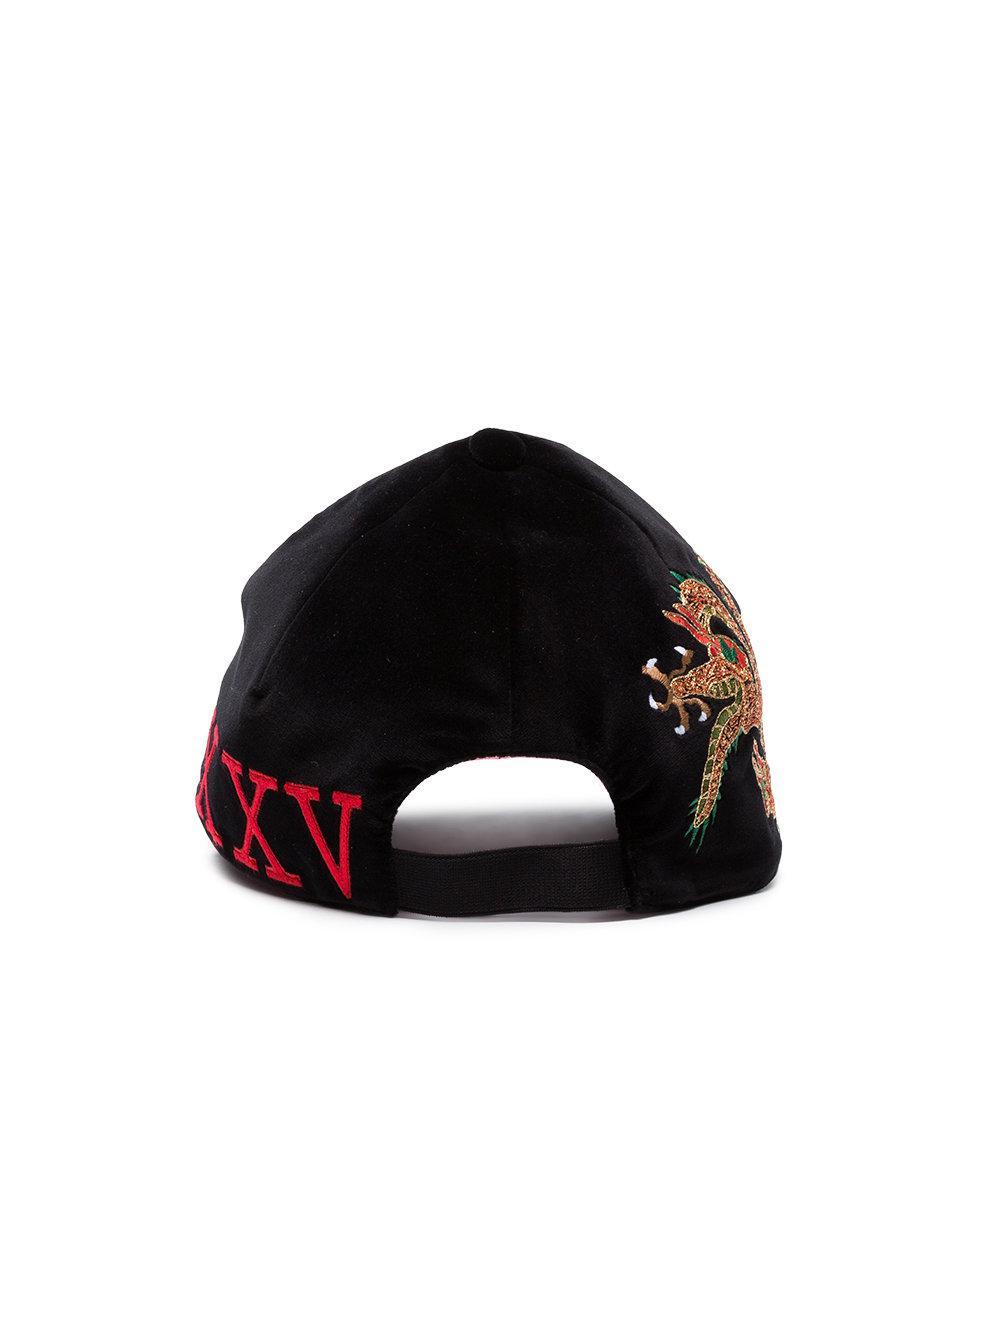 d297317e Gucci - Black Dragon Embroidered Velvet Cap - Lyst. View fullscreen